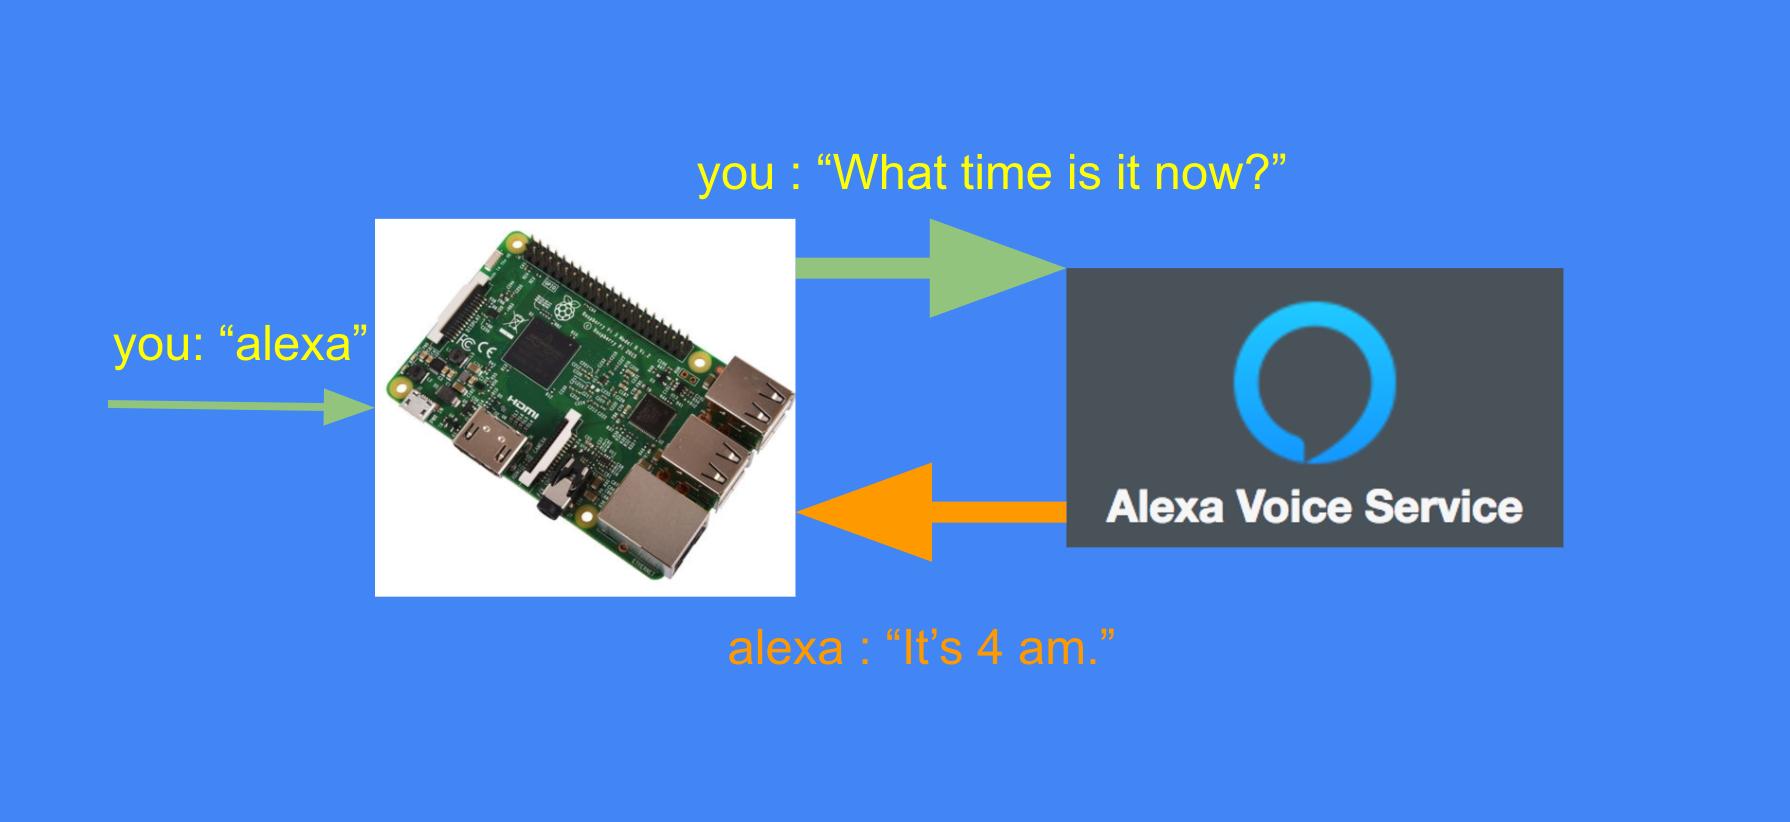 screenshot_jawsdays2017-alexa-workshop-01.png